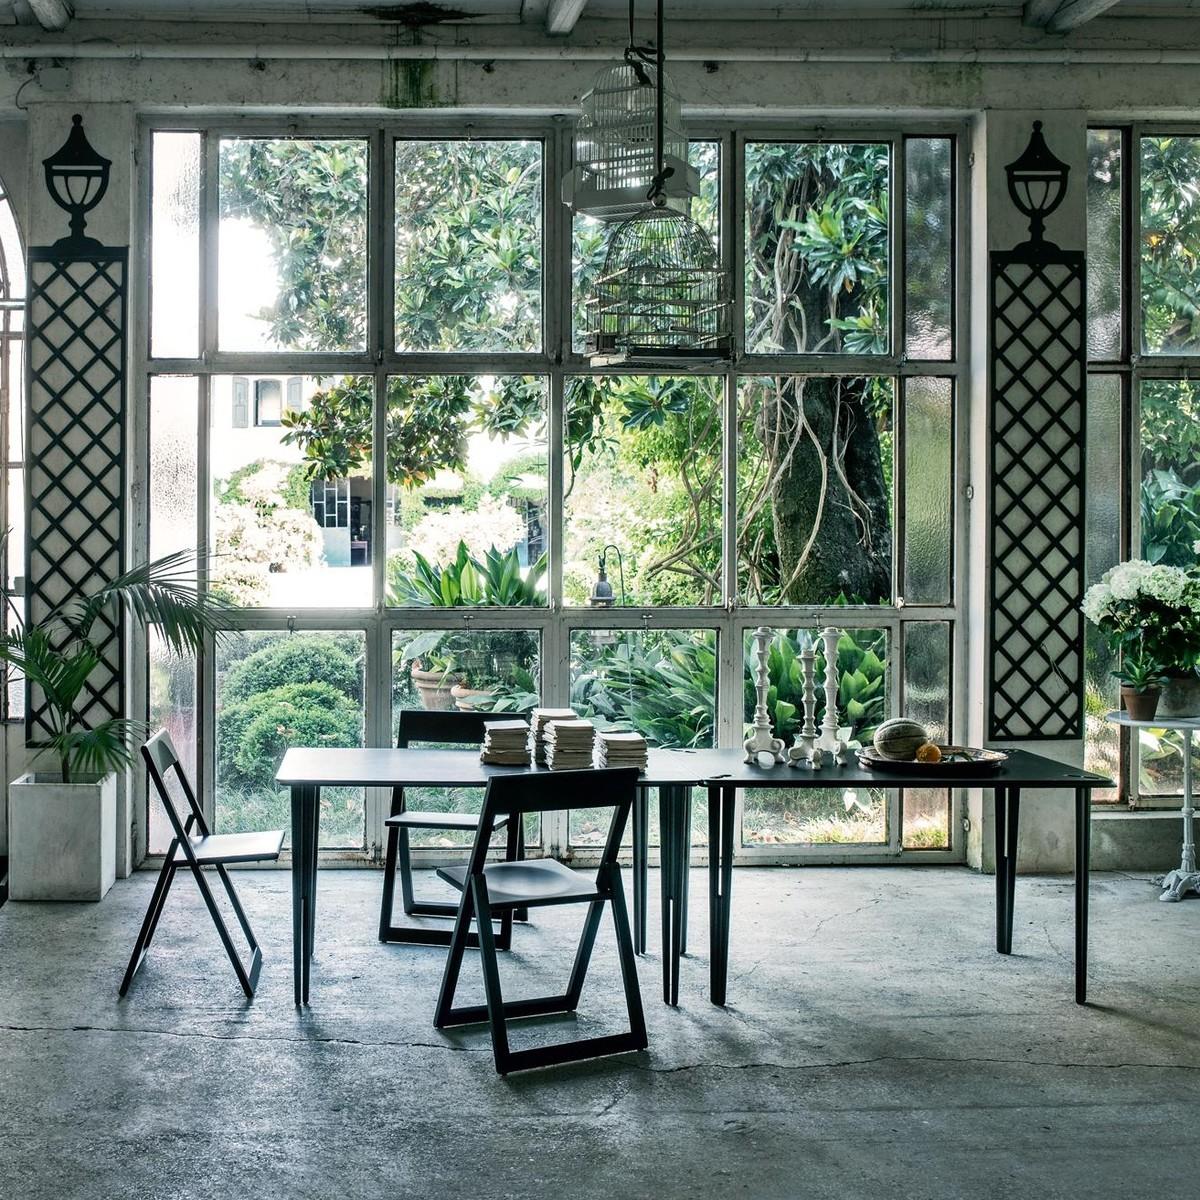 aviva klappstuhl magis. Black Bedroom Furniture Sets. Home Design Ideas